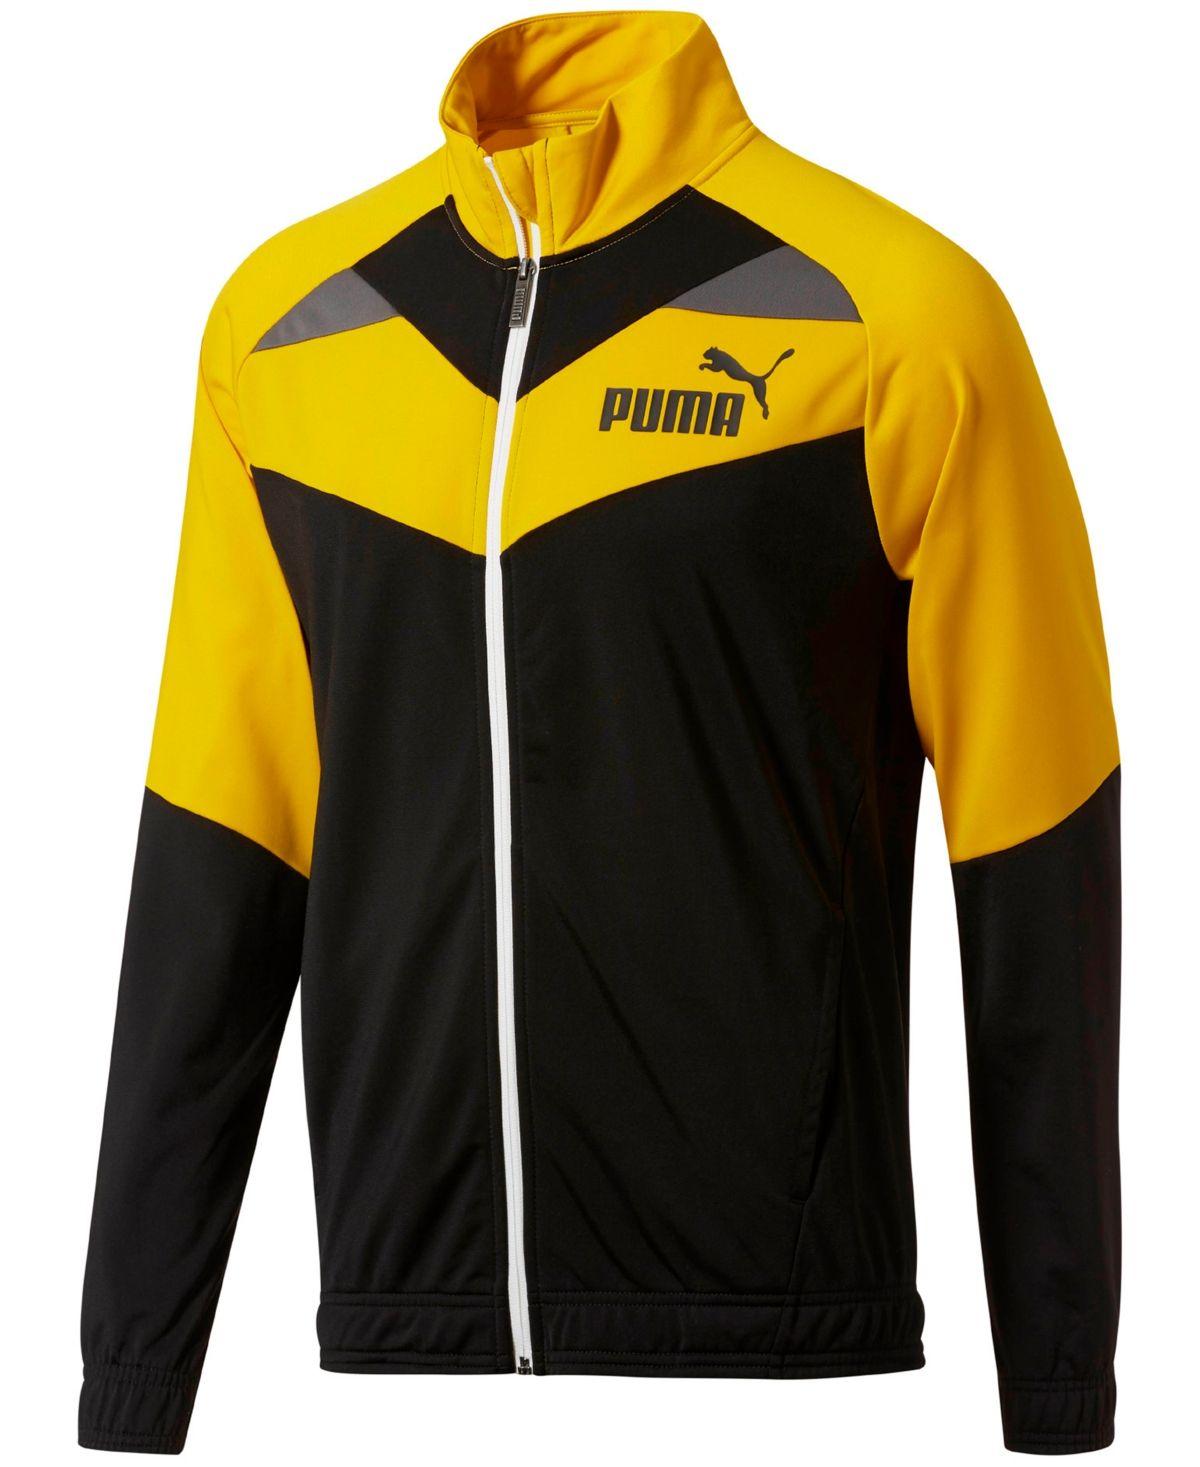 Puma Men S Colorblocked Track Jacket Yellow Black Mens Outdoor Jackets Casual Wear For Men Sports Fashion Men [ 1467 x 1200 Pixel ]